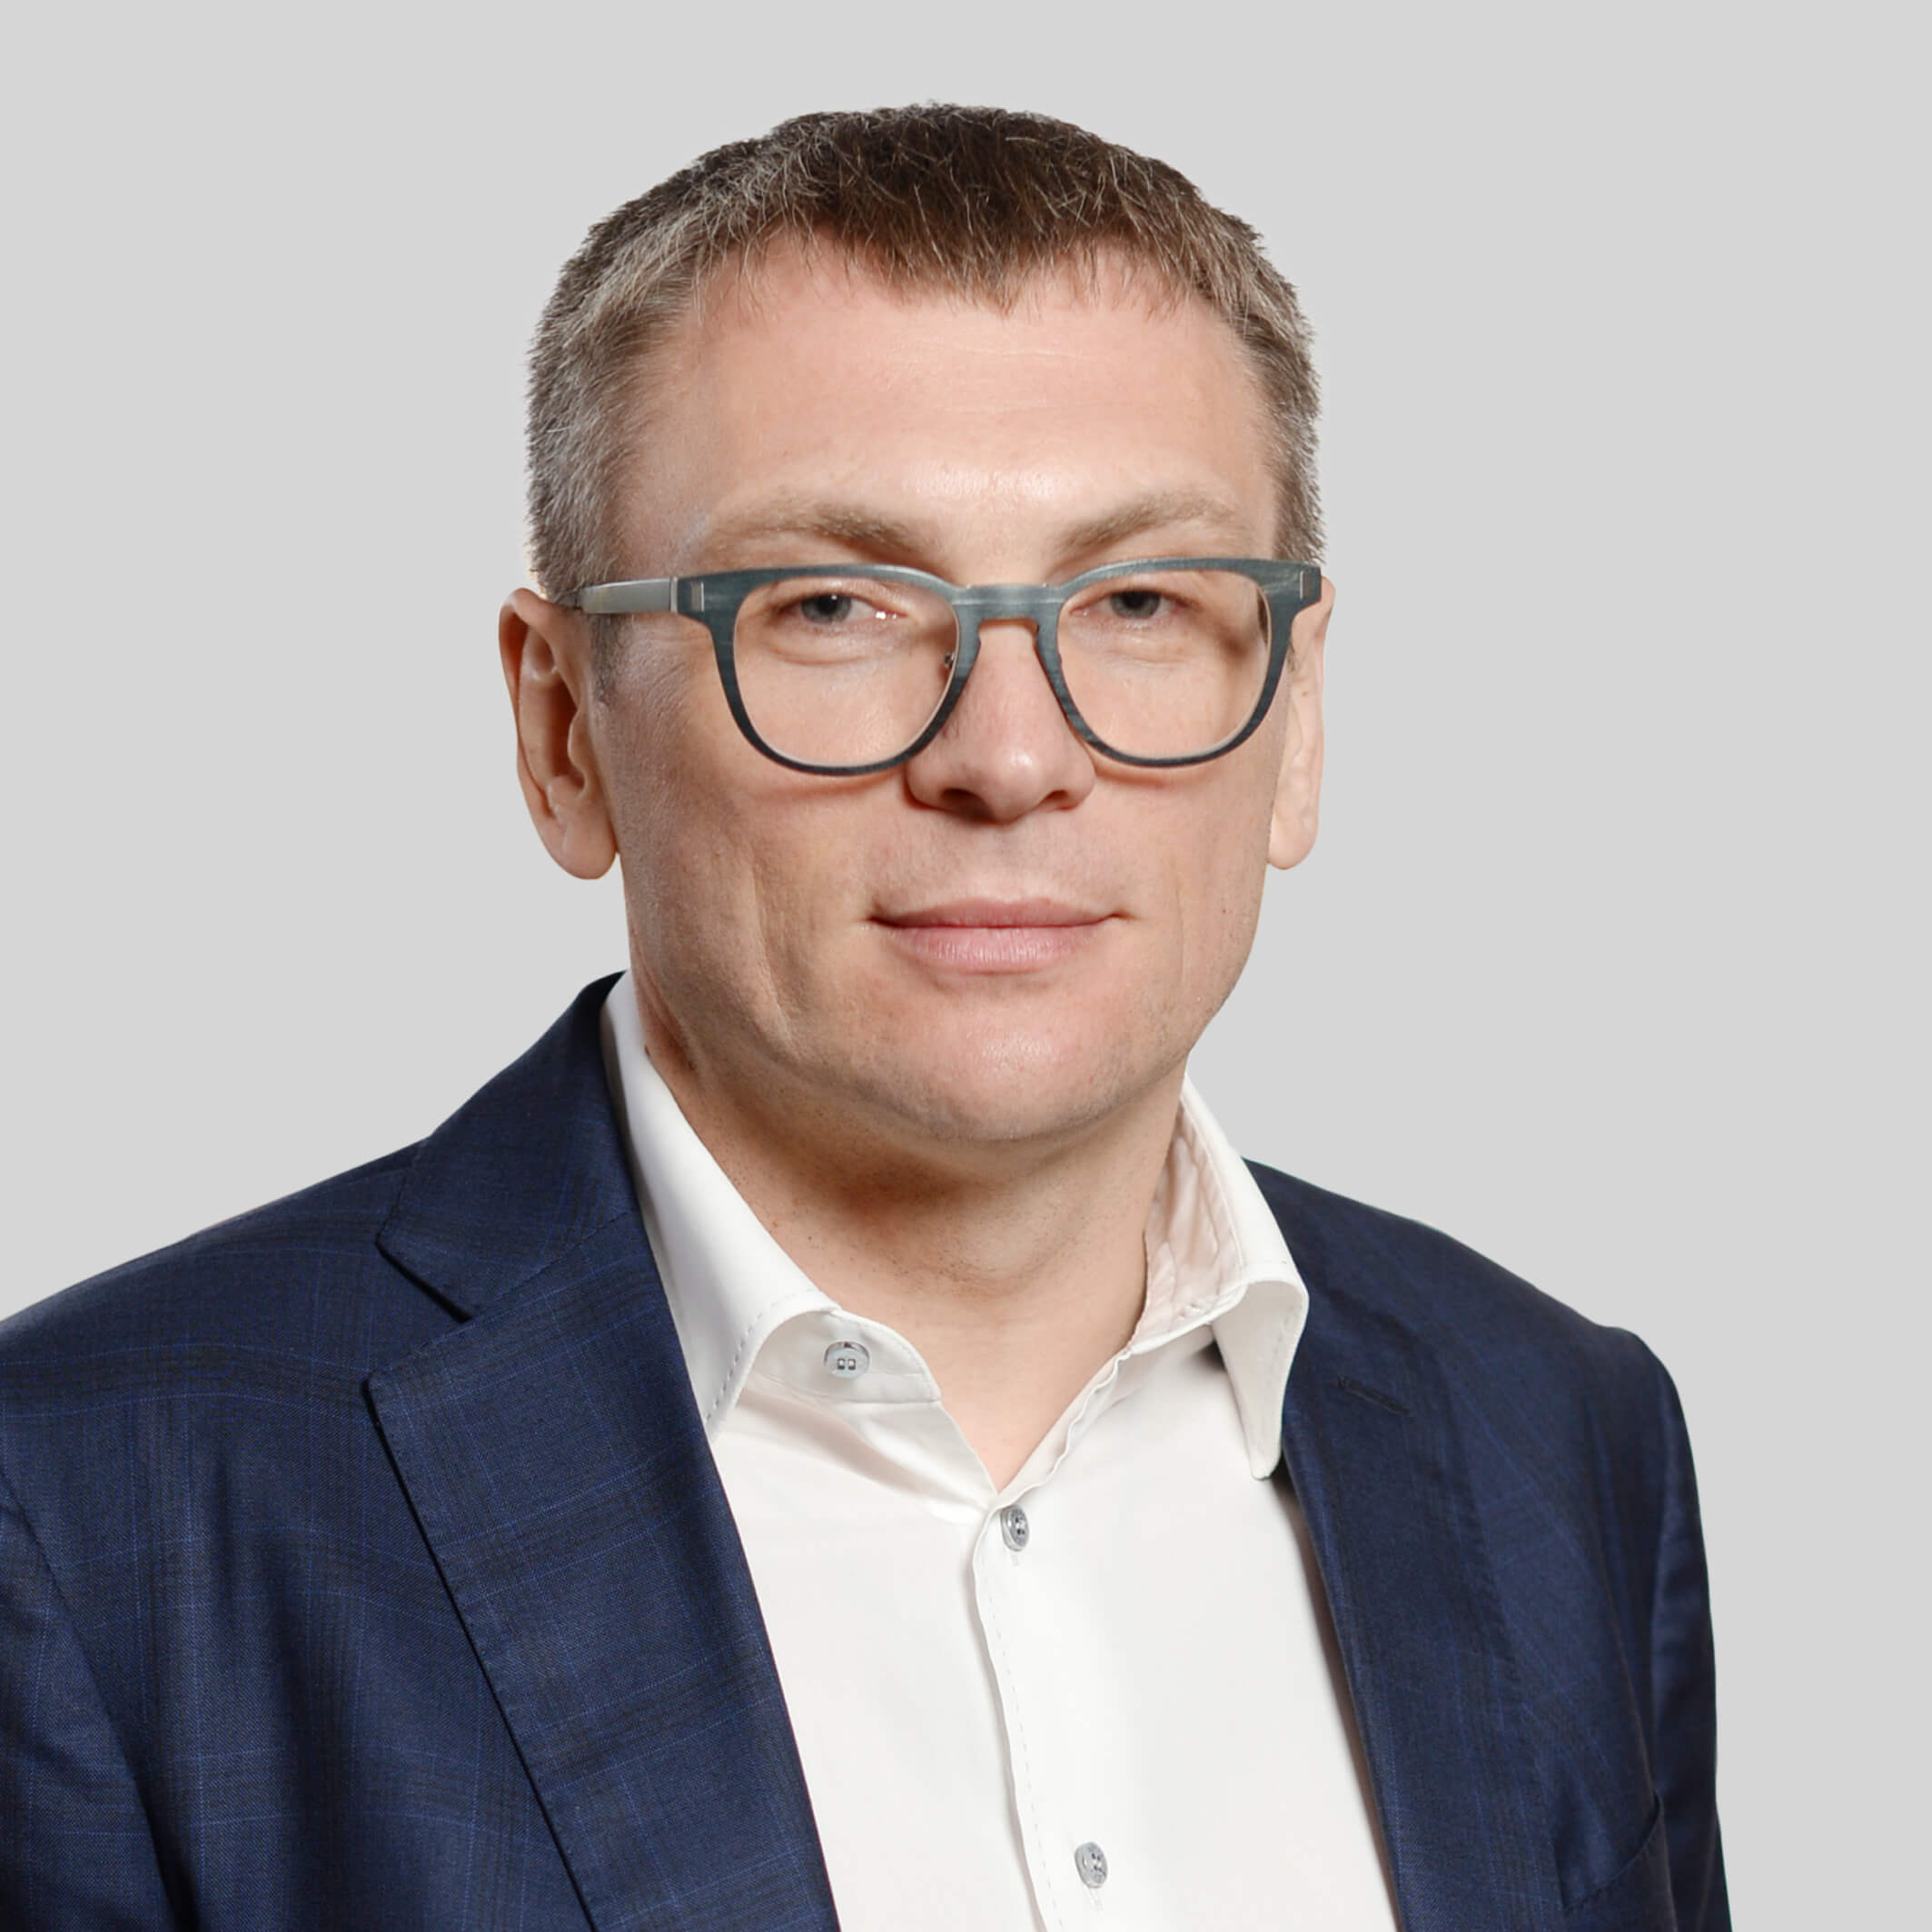 Віктор Барсук